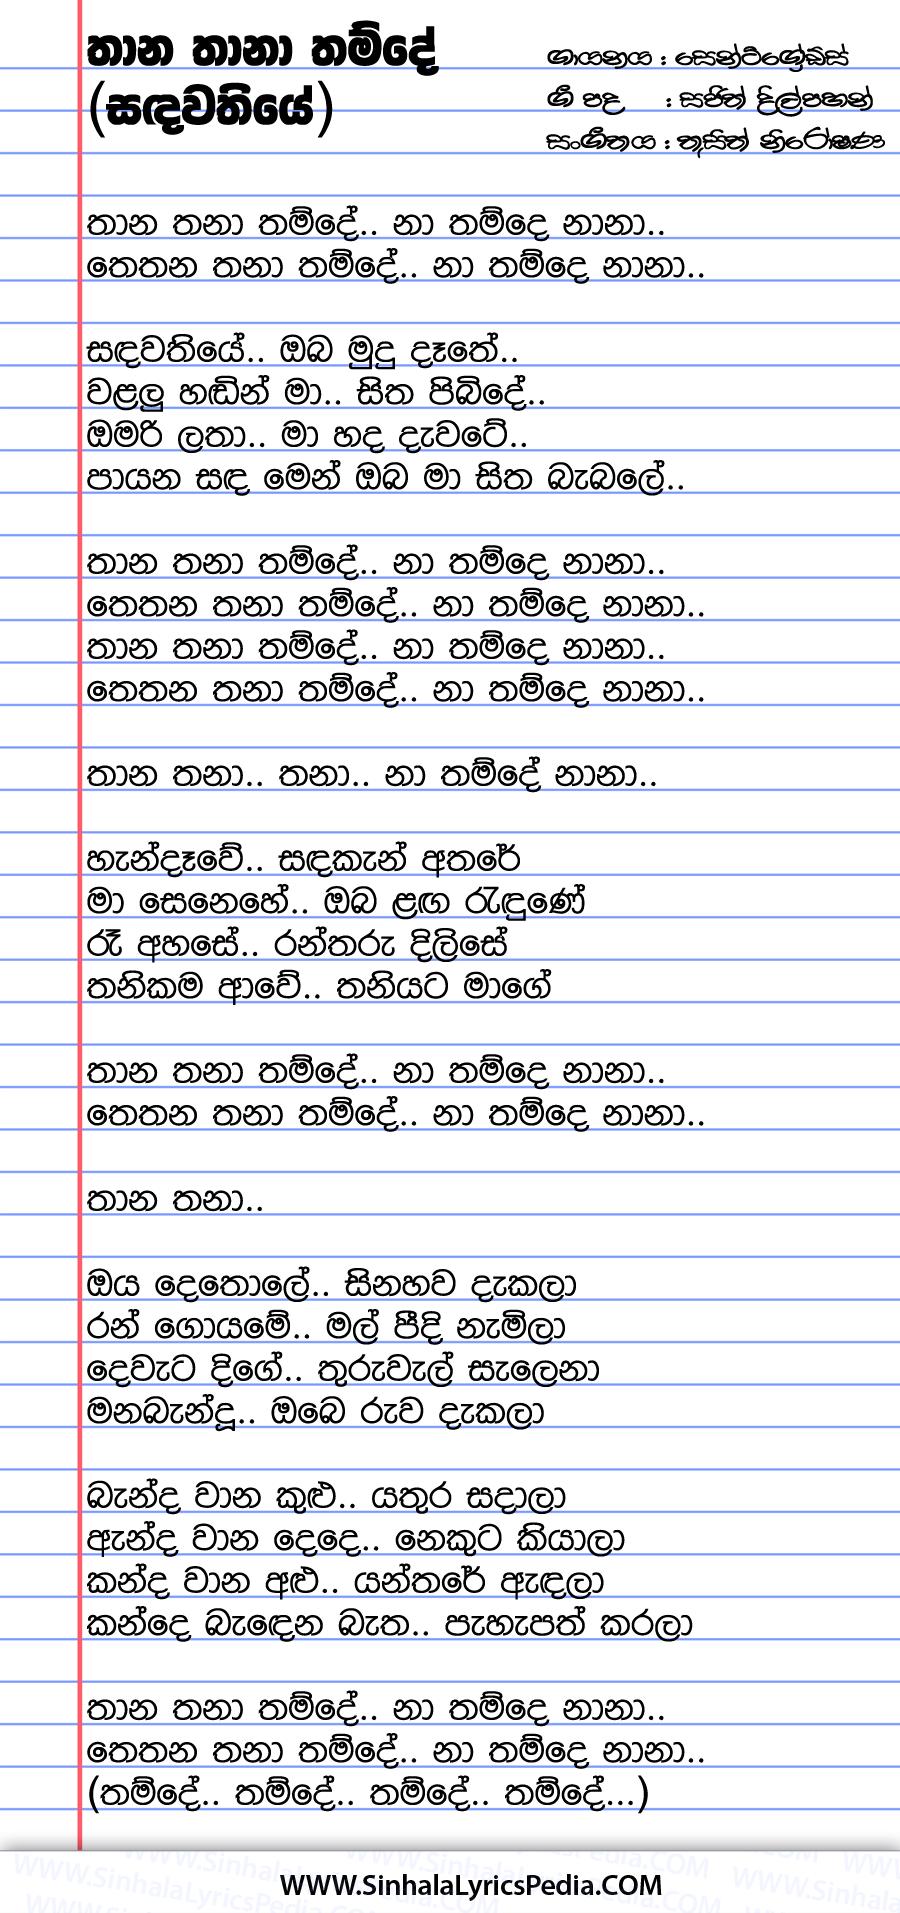 Thana Thana Thamde (Sandawathiye) Song Lyrics